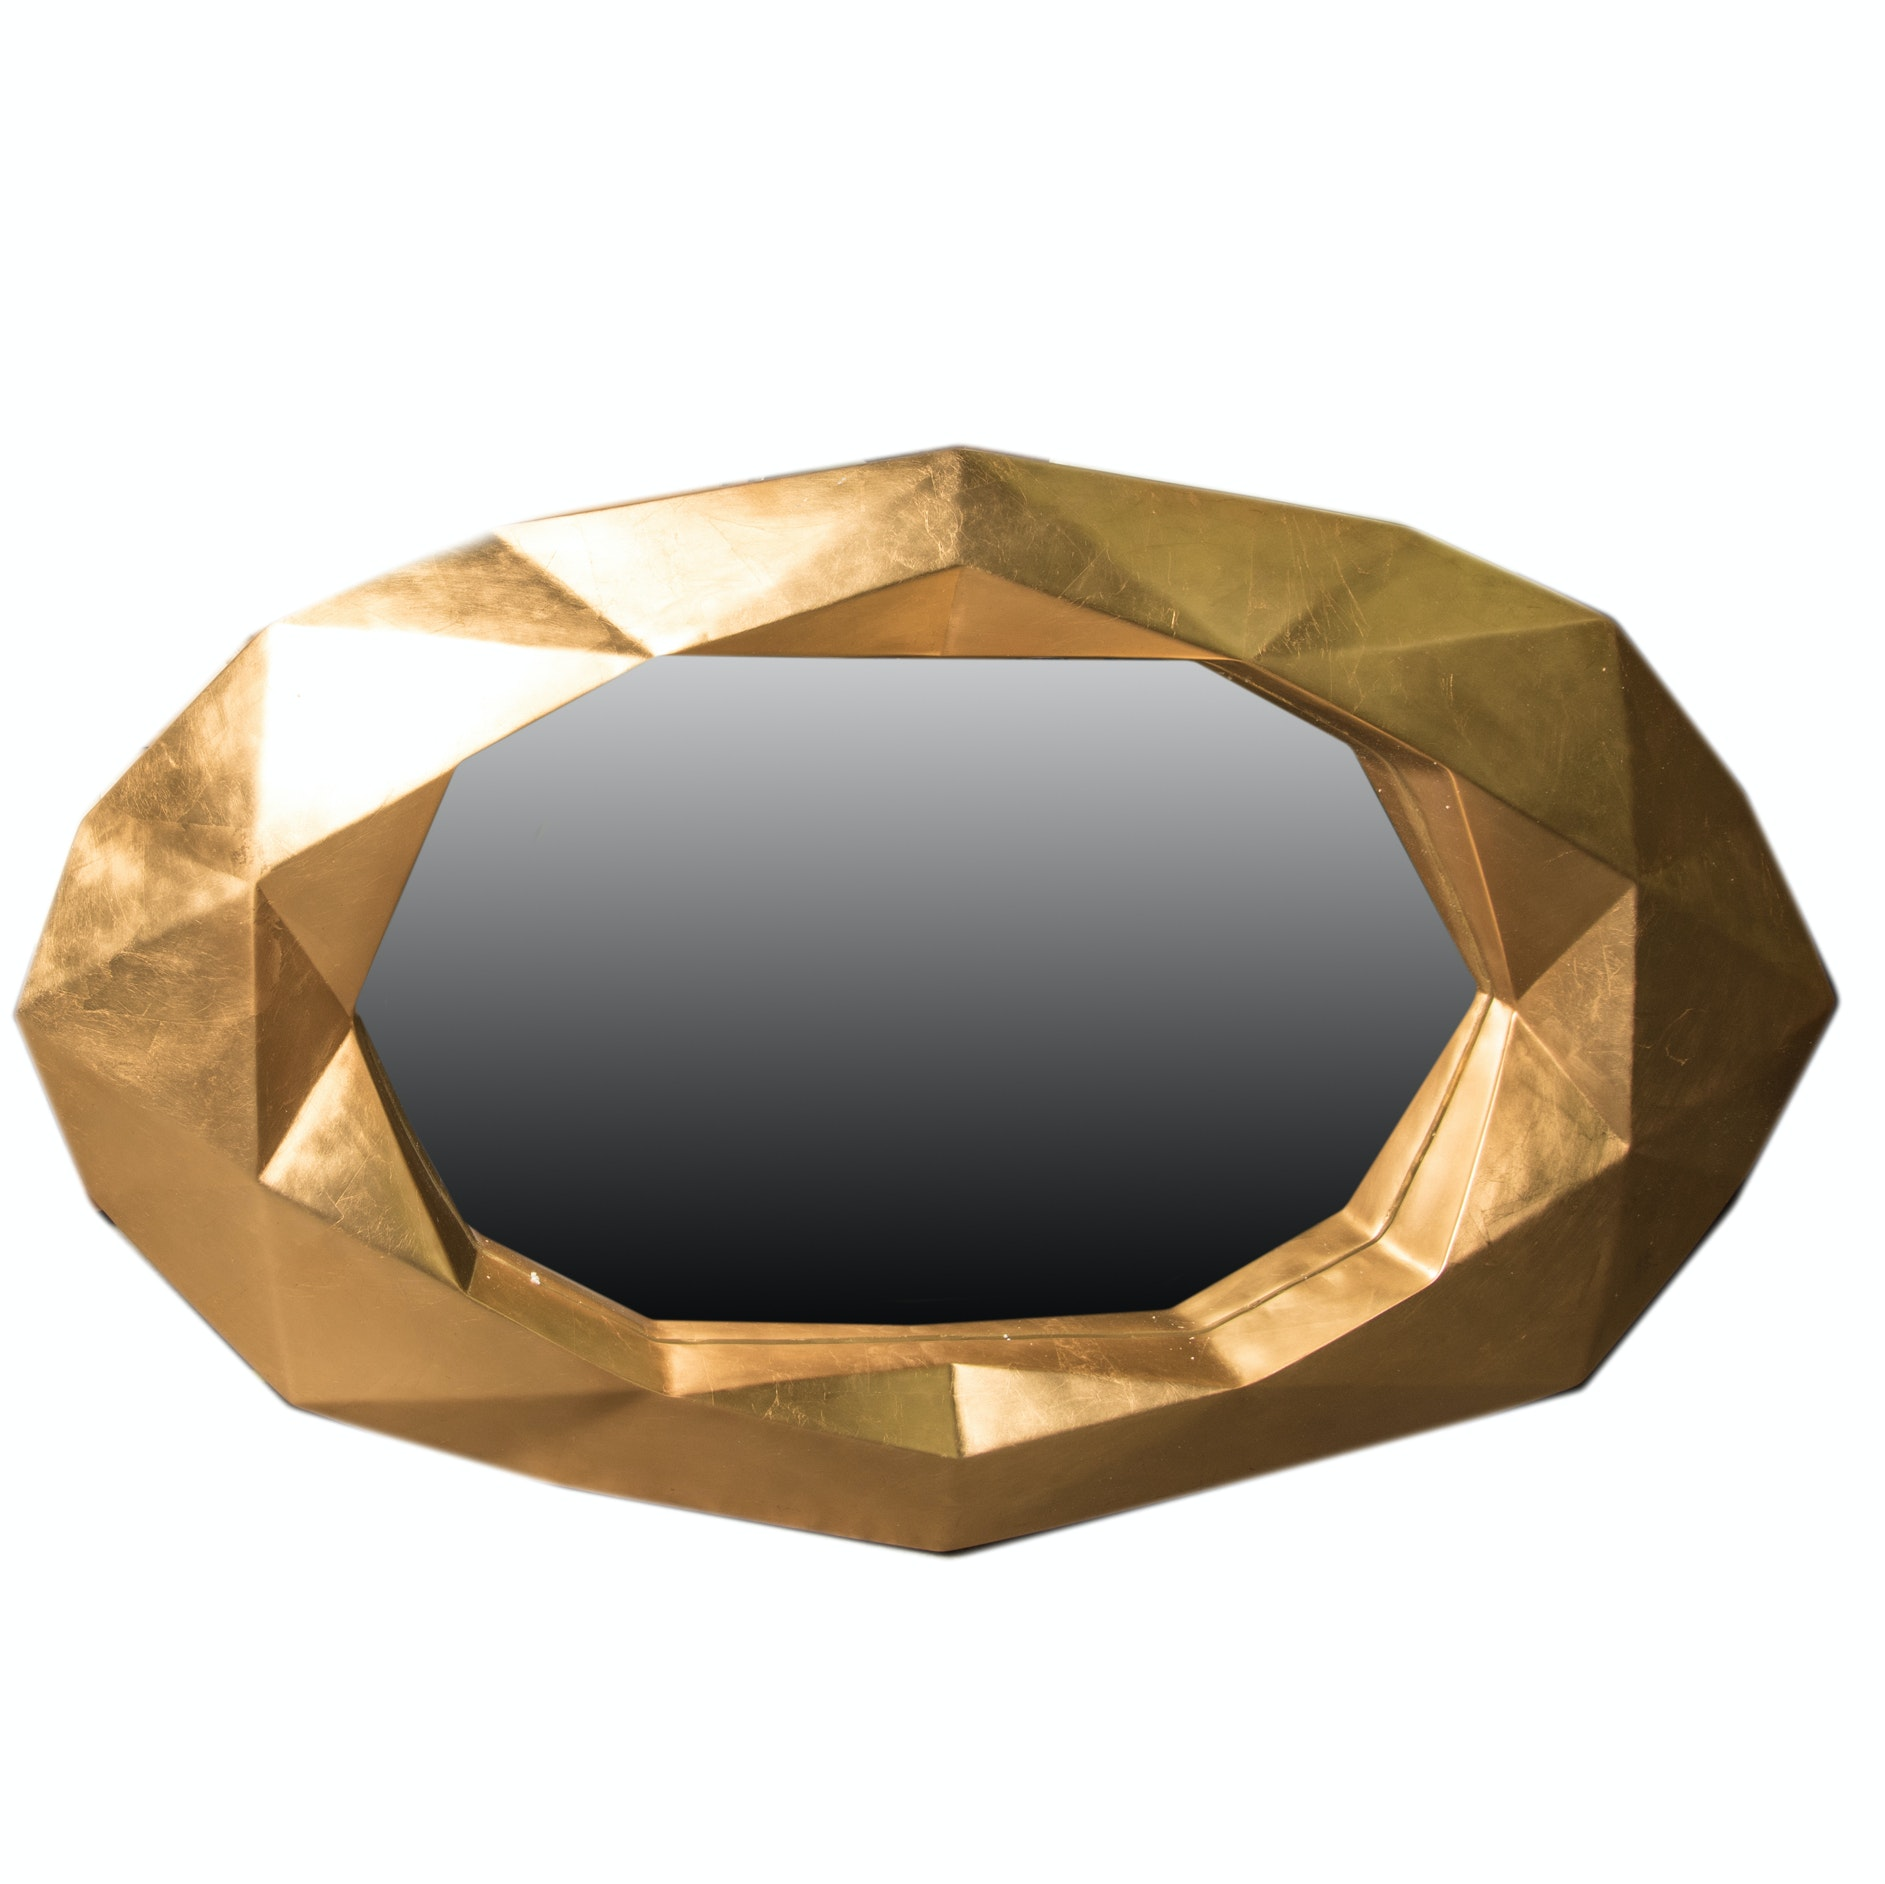 "Arteriors ""Fallon"" Gold Leaf Wall Mirror"